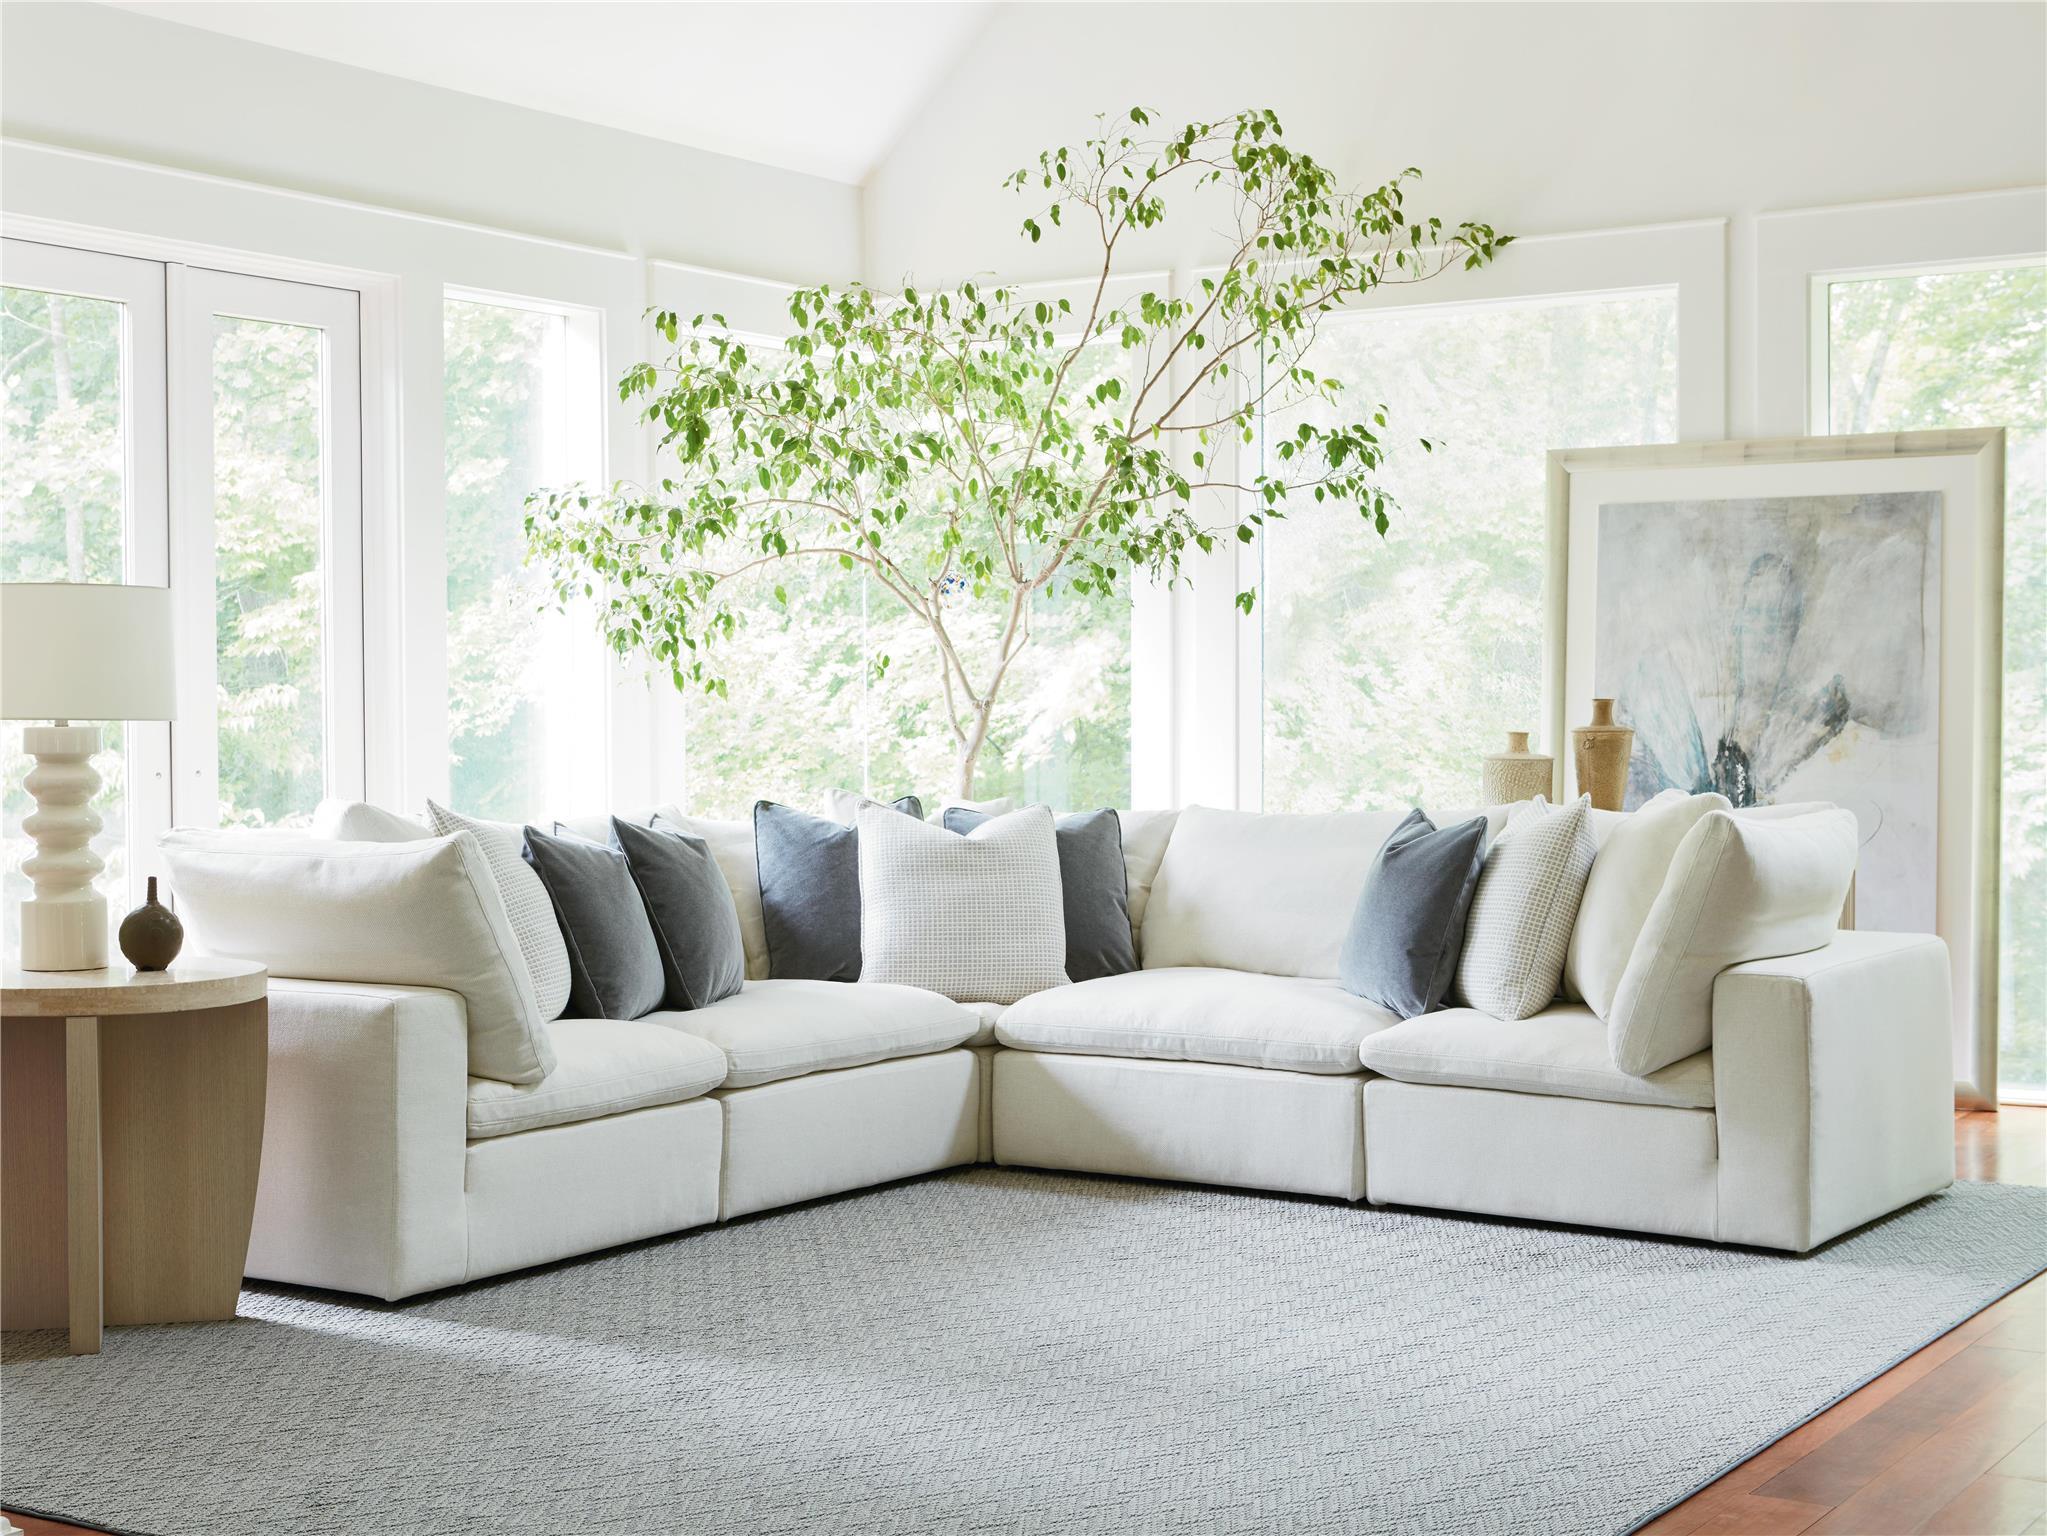 palmer sofa slipcovers loveseat thesofa